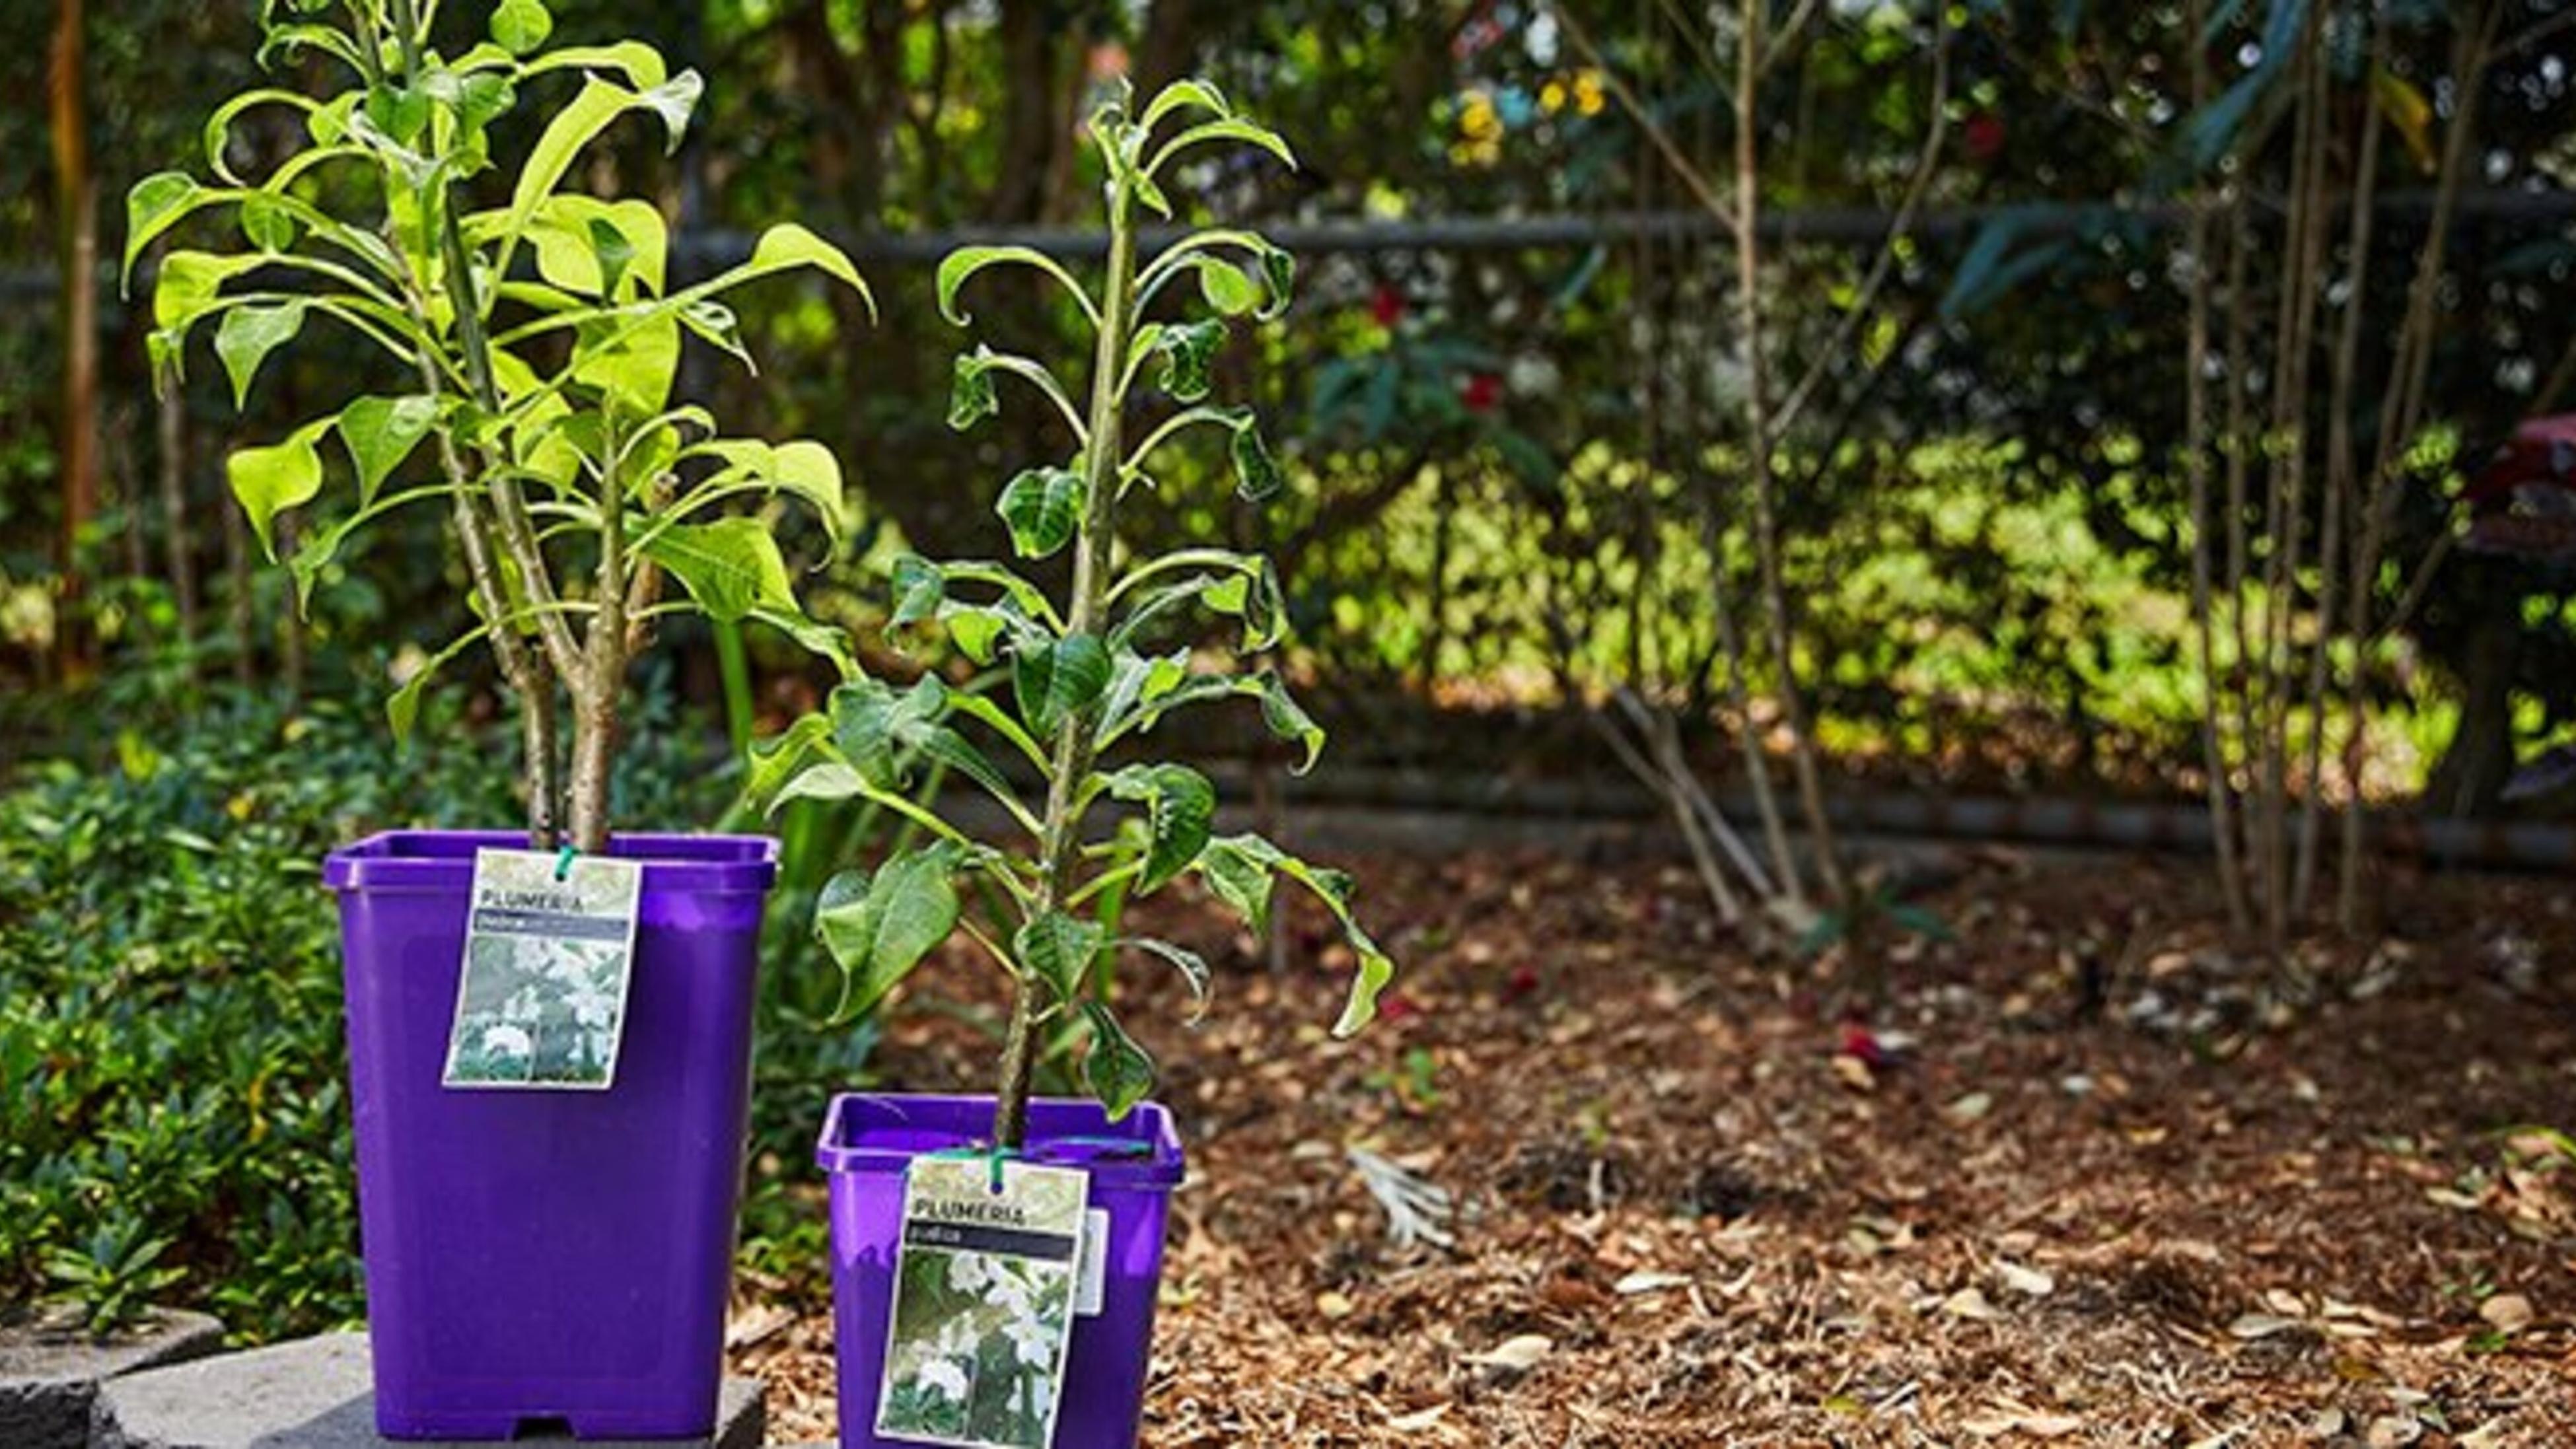 Two plumeria plants in purple plastic pots